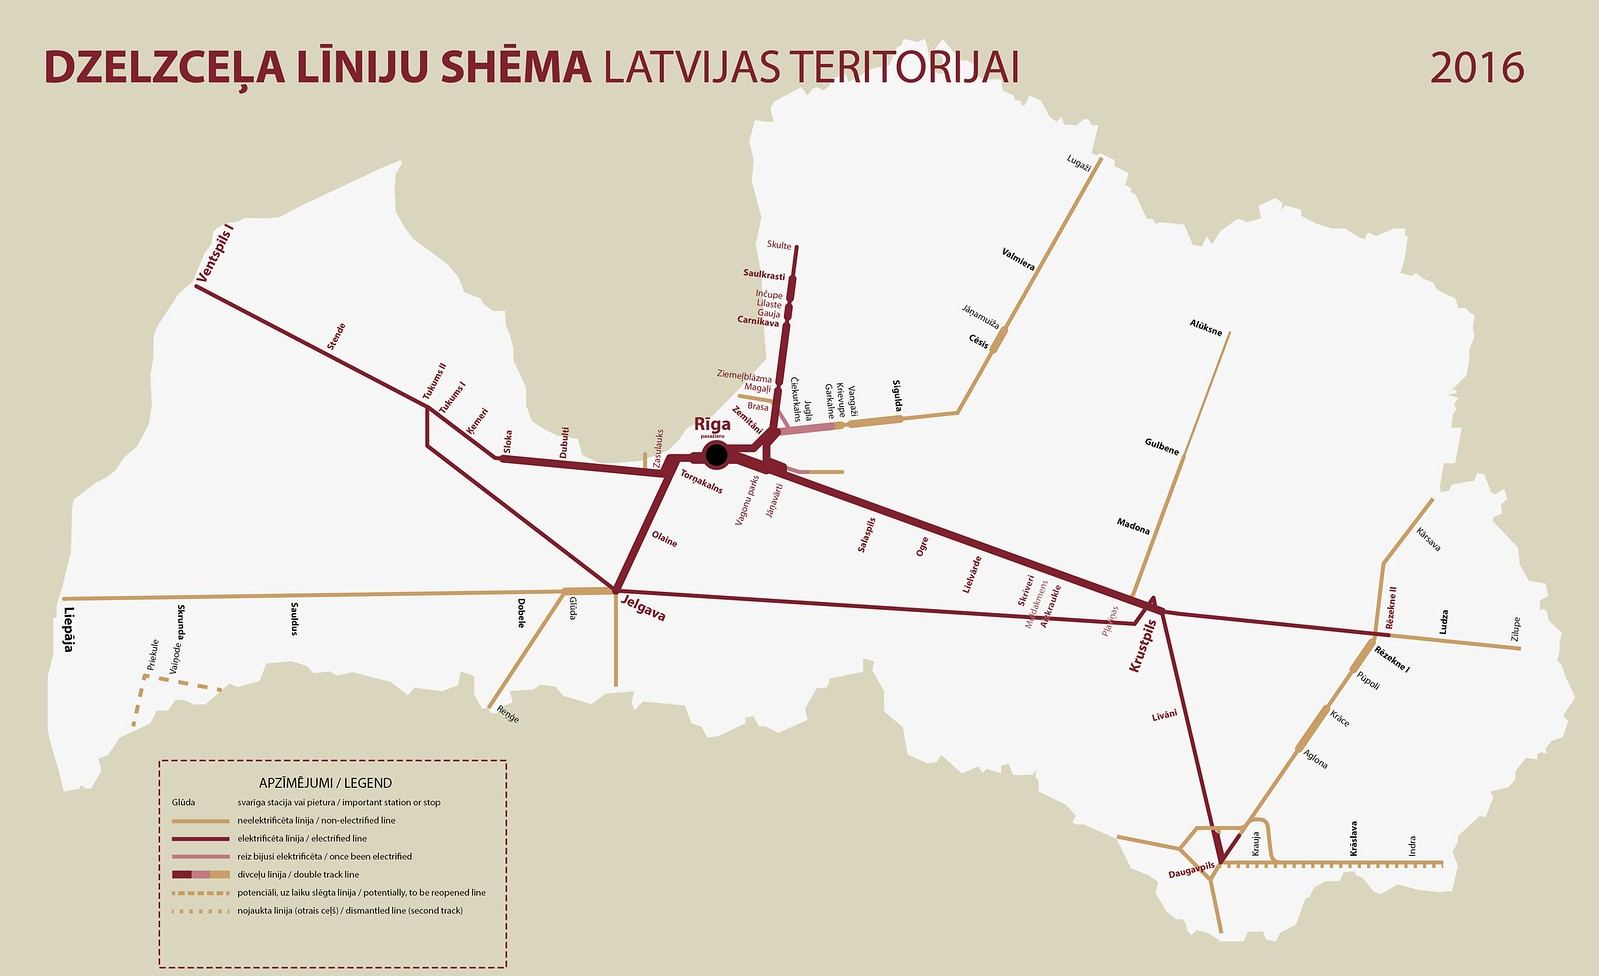 Latvia Railways Dzelzce Page 22 Skyscrapercity Belarus Wiring Schematic 2018 Dobule Electrified To Russia Maeii Klaipda Again Through Priekule No High Speed Line Moscow As I Dont Believe It